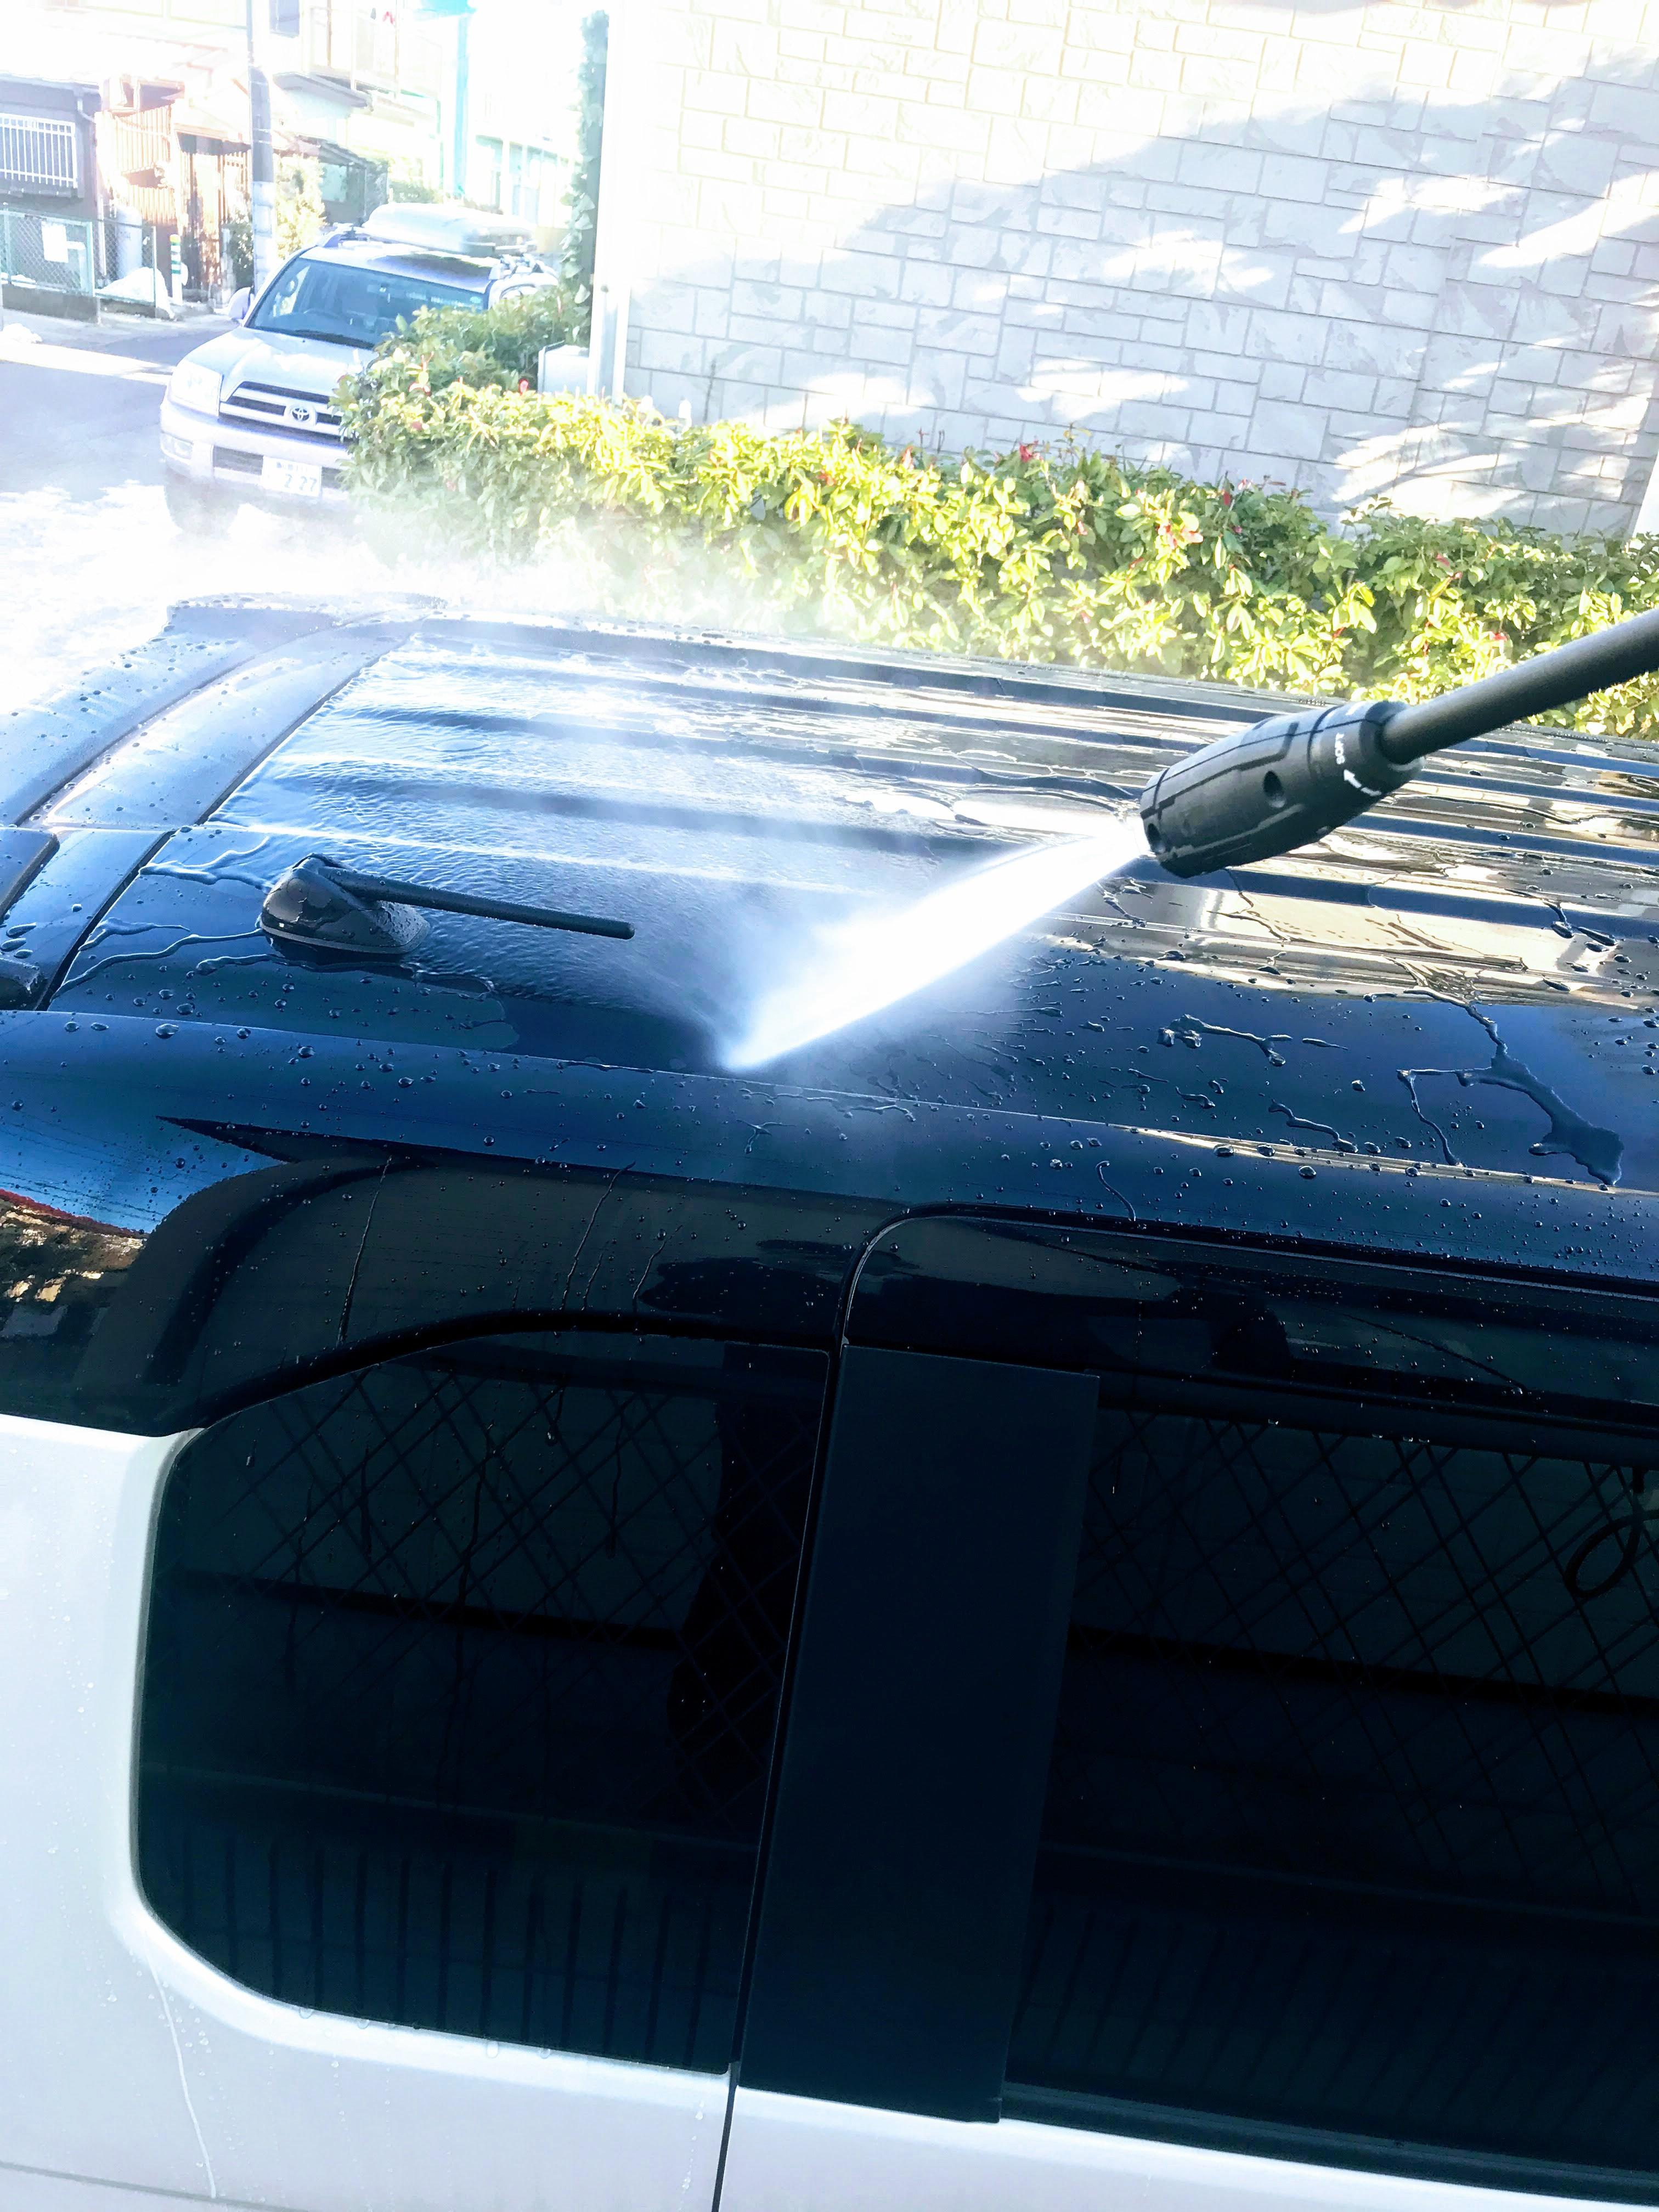 N-BOX納車後初の洗車!雪の汚れが落ちてスッキリ♪